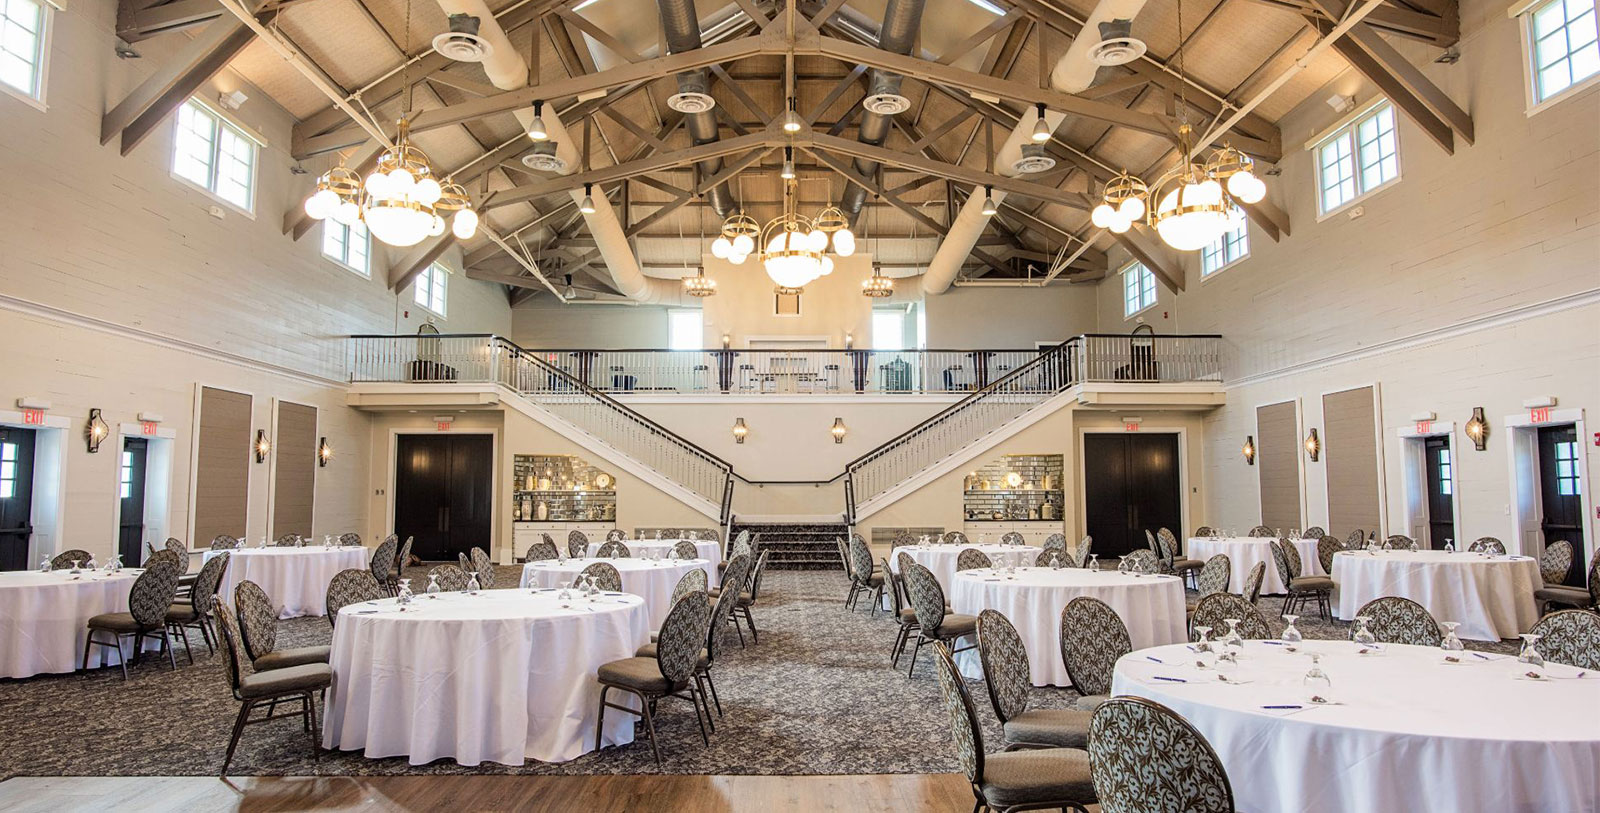 Image of Morgan Ballroom, Jekyll Island Club Resort in Jekyll Island, Georgia, 1886, Member of Historic Hotels of America, Special Occasions